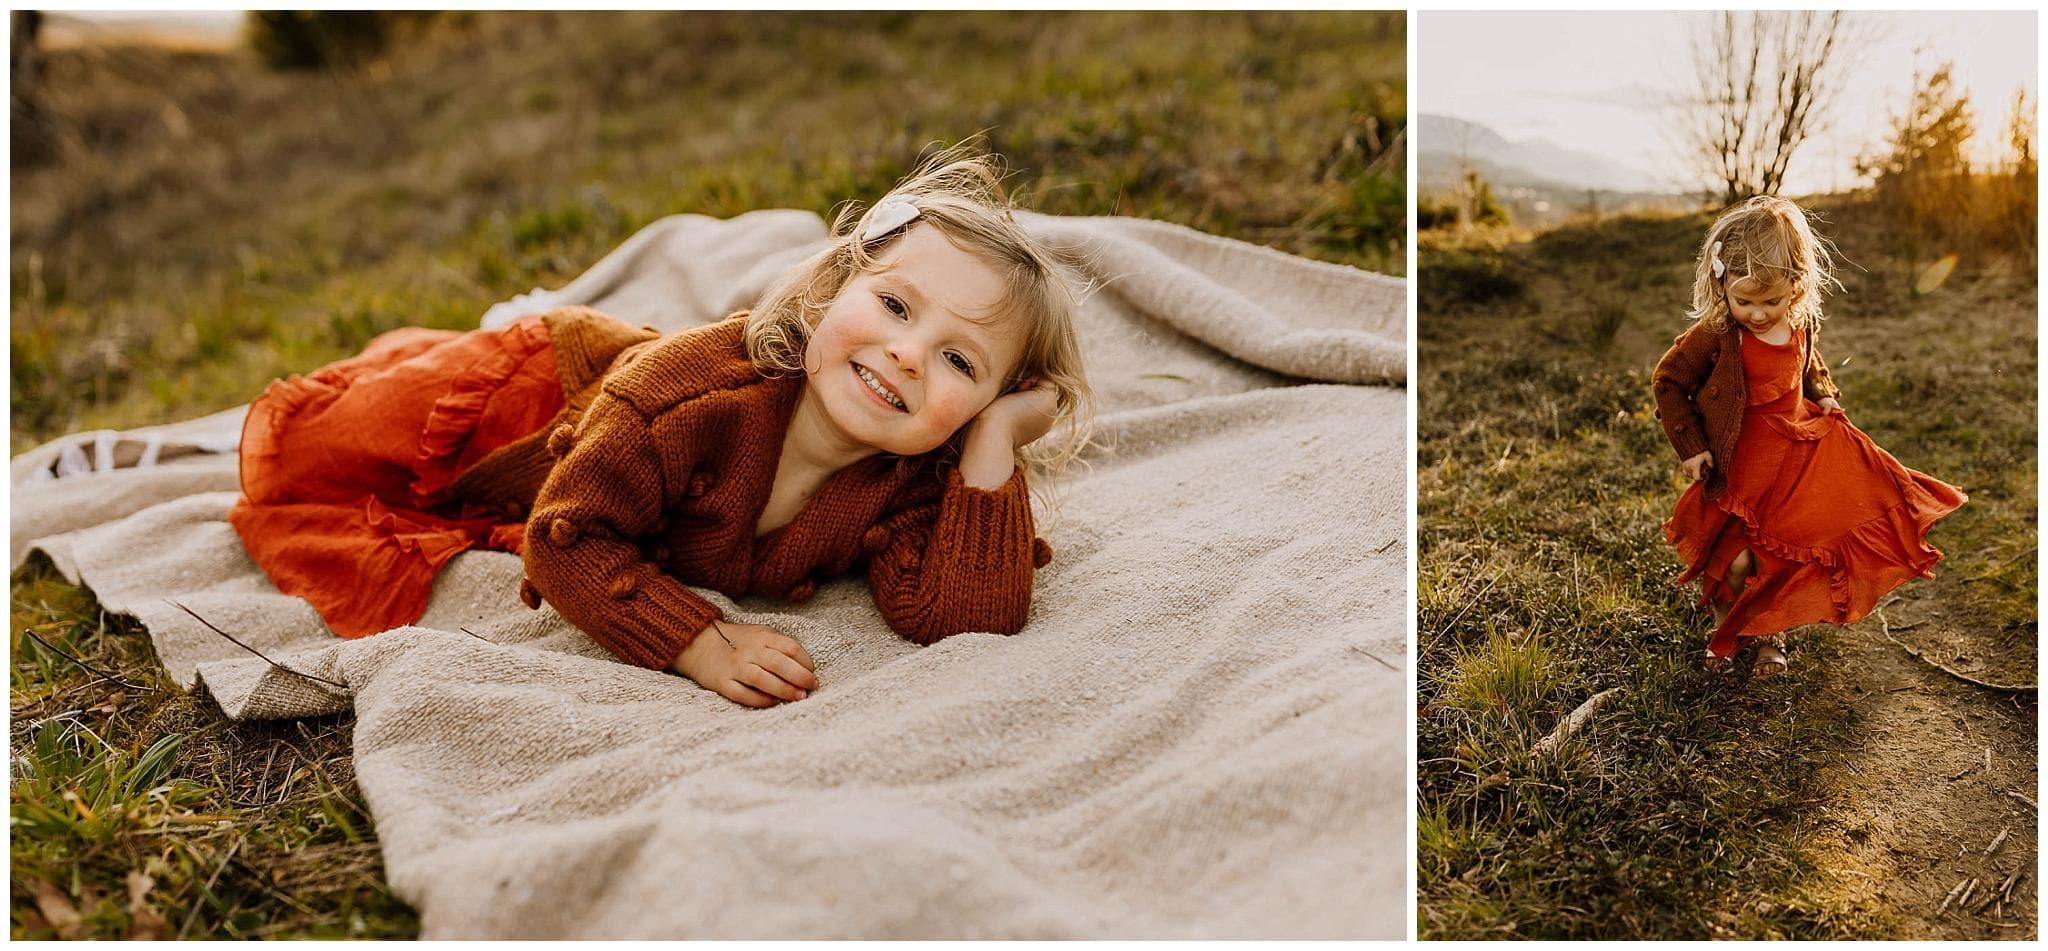 little kid with joyfolie dress on